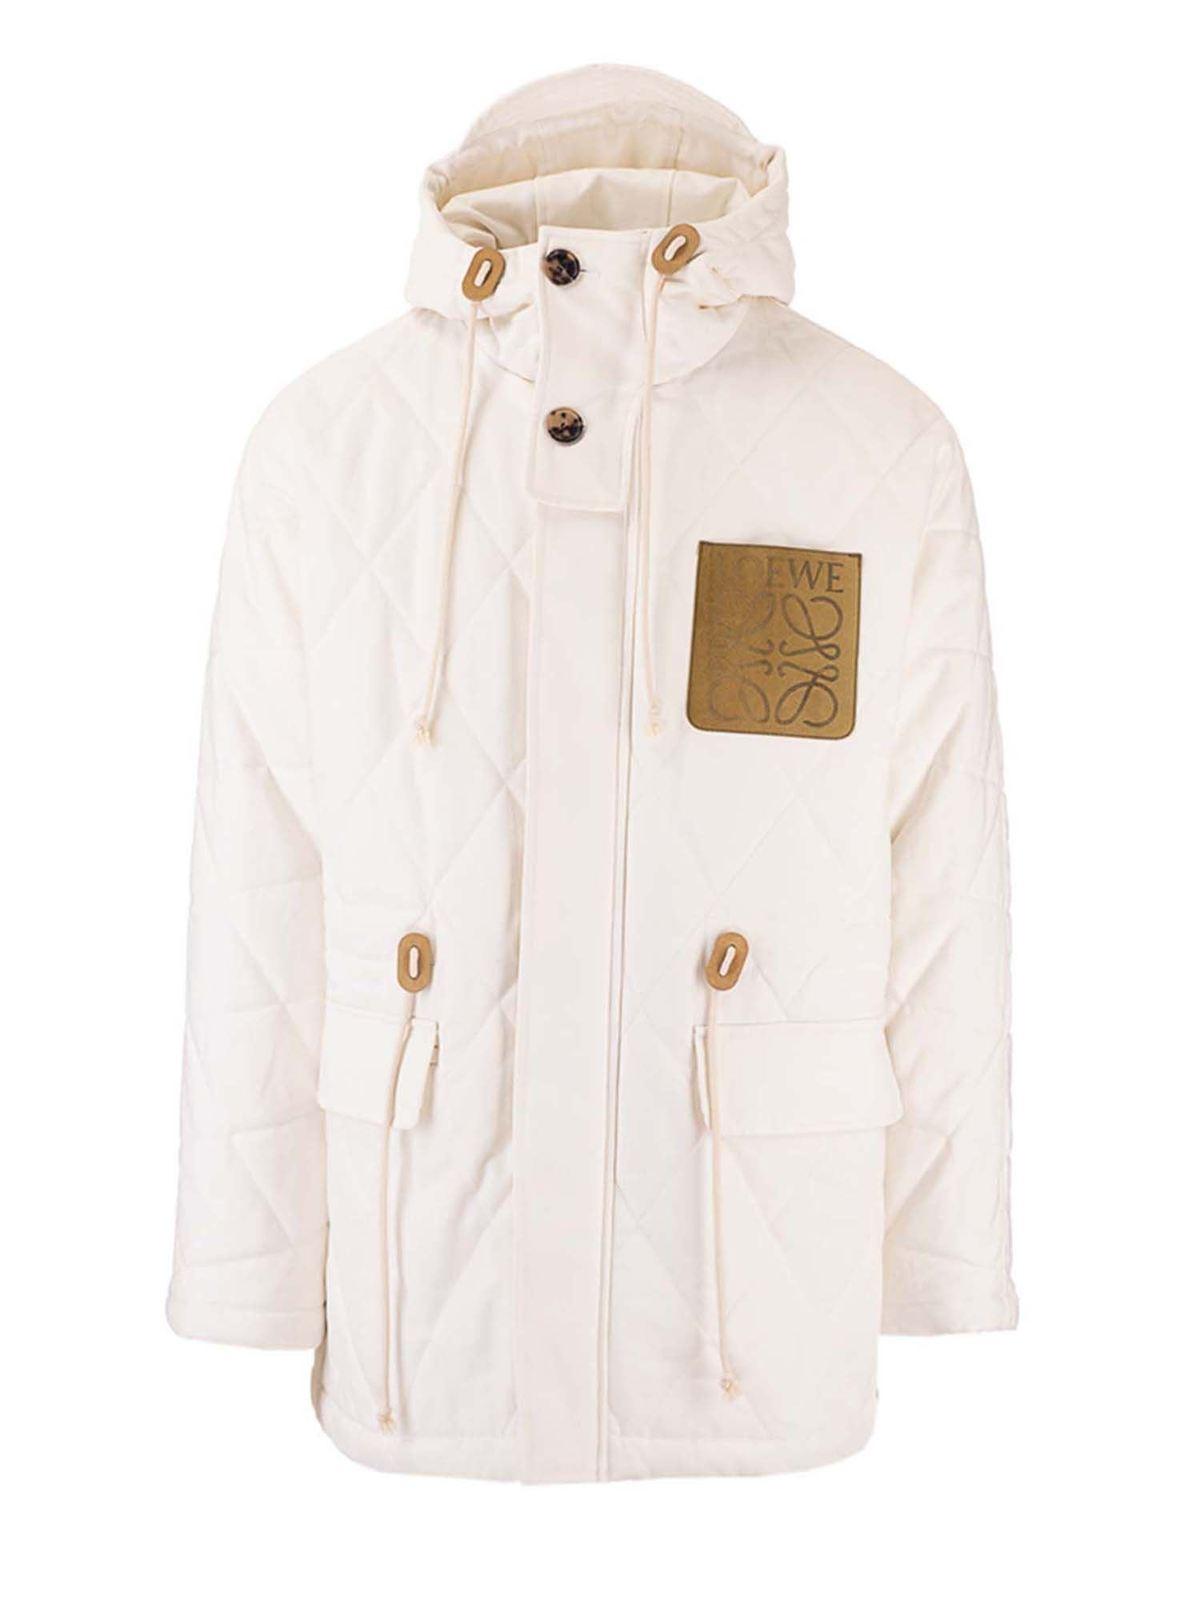 Loewe Jackets ANAGRAM LOGO PARKA IN WHITE